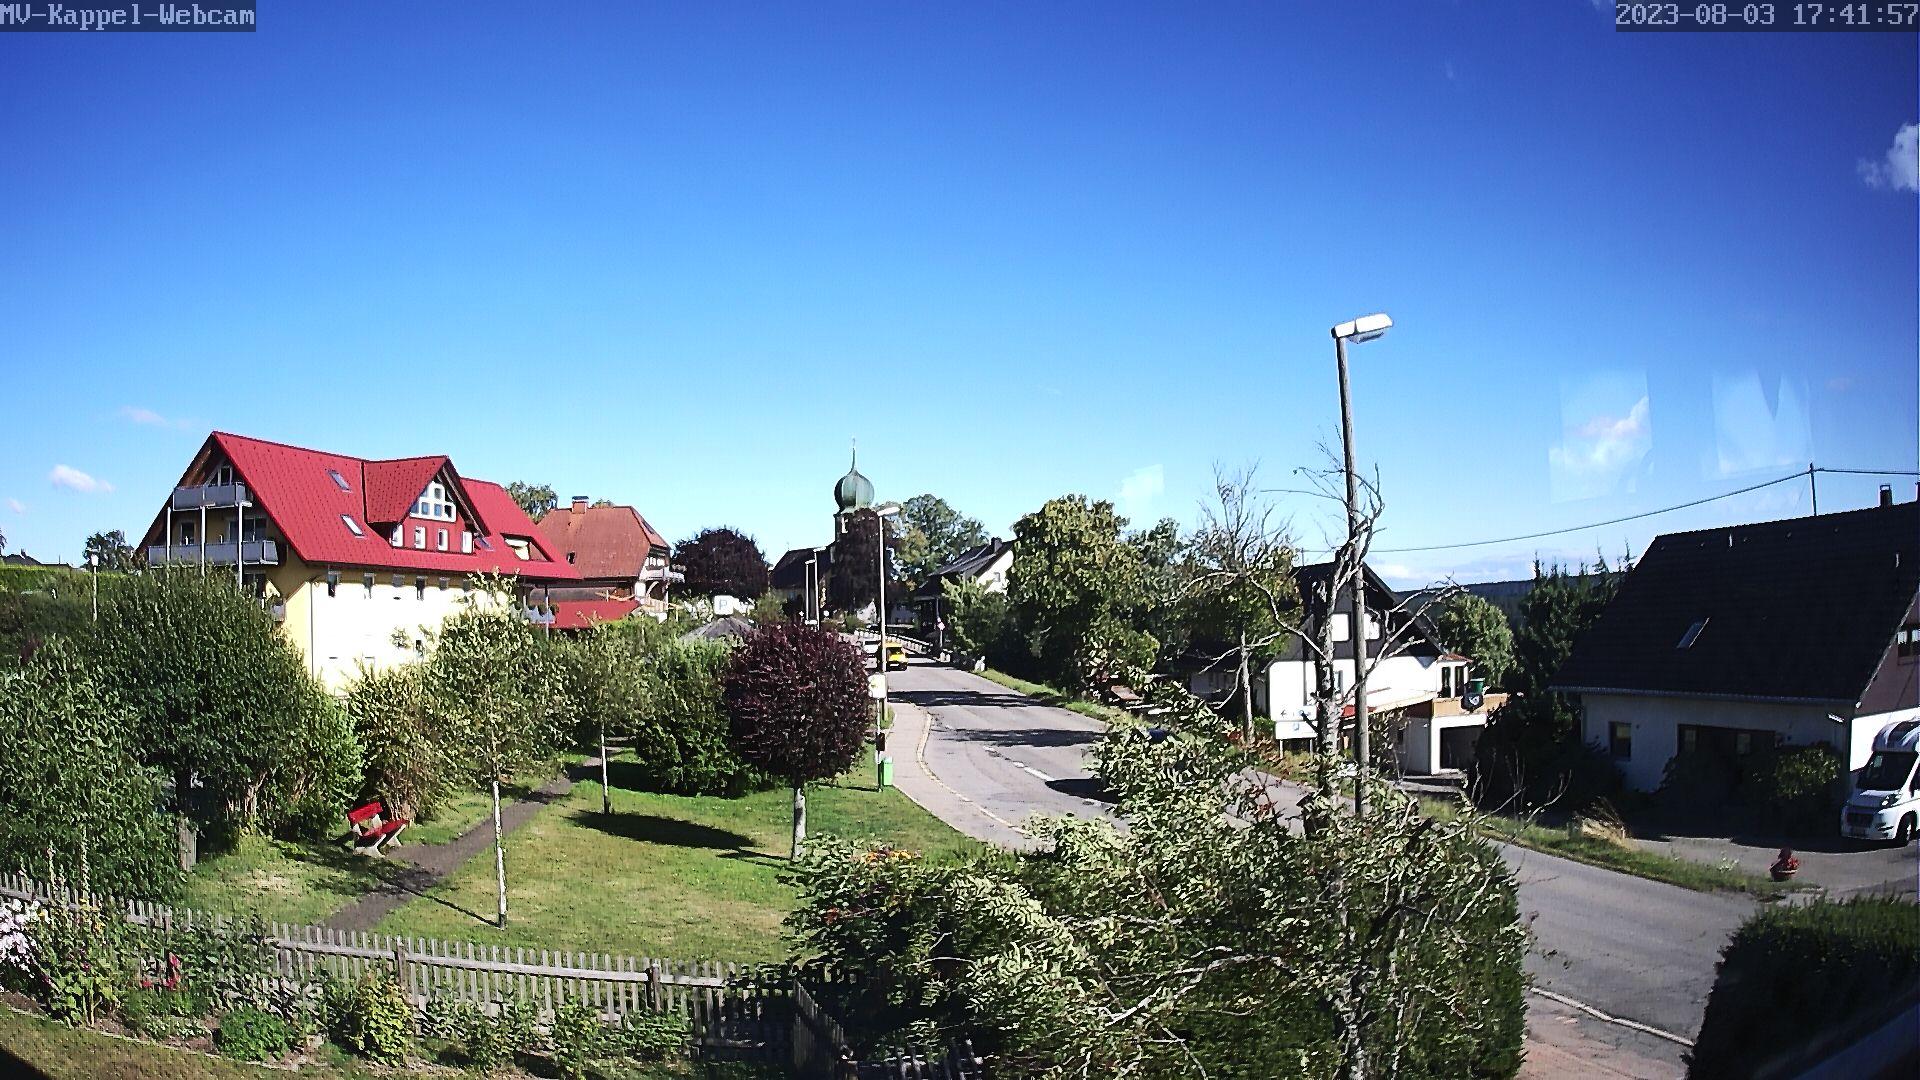 Kappel (Lenzkirch) – Ortsmitte webcam Live